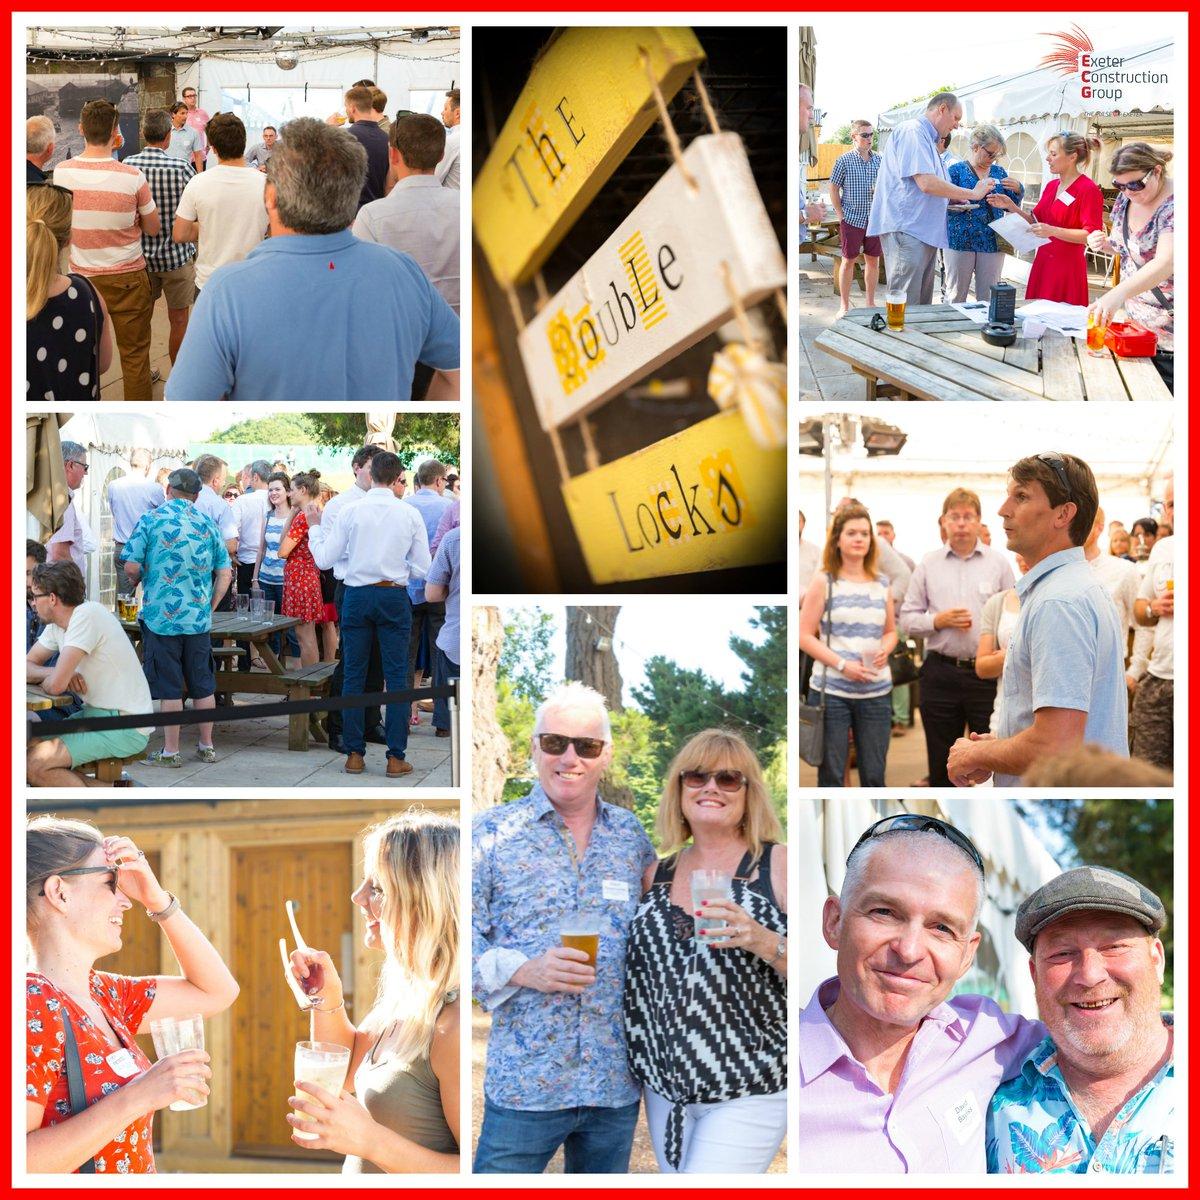 We love a BBQ #ECG #event @DoublelocksPub @BaileyPartner #networking #Construction #Exeter #Devon #Professional #summer #BBQ #SummerSolstice<br>http://pic.twitter.com/nm8rekGxUh